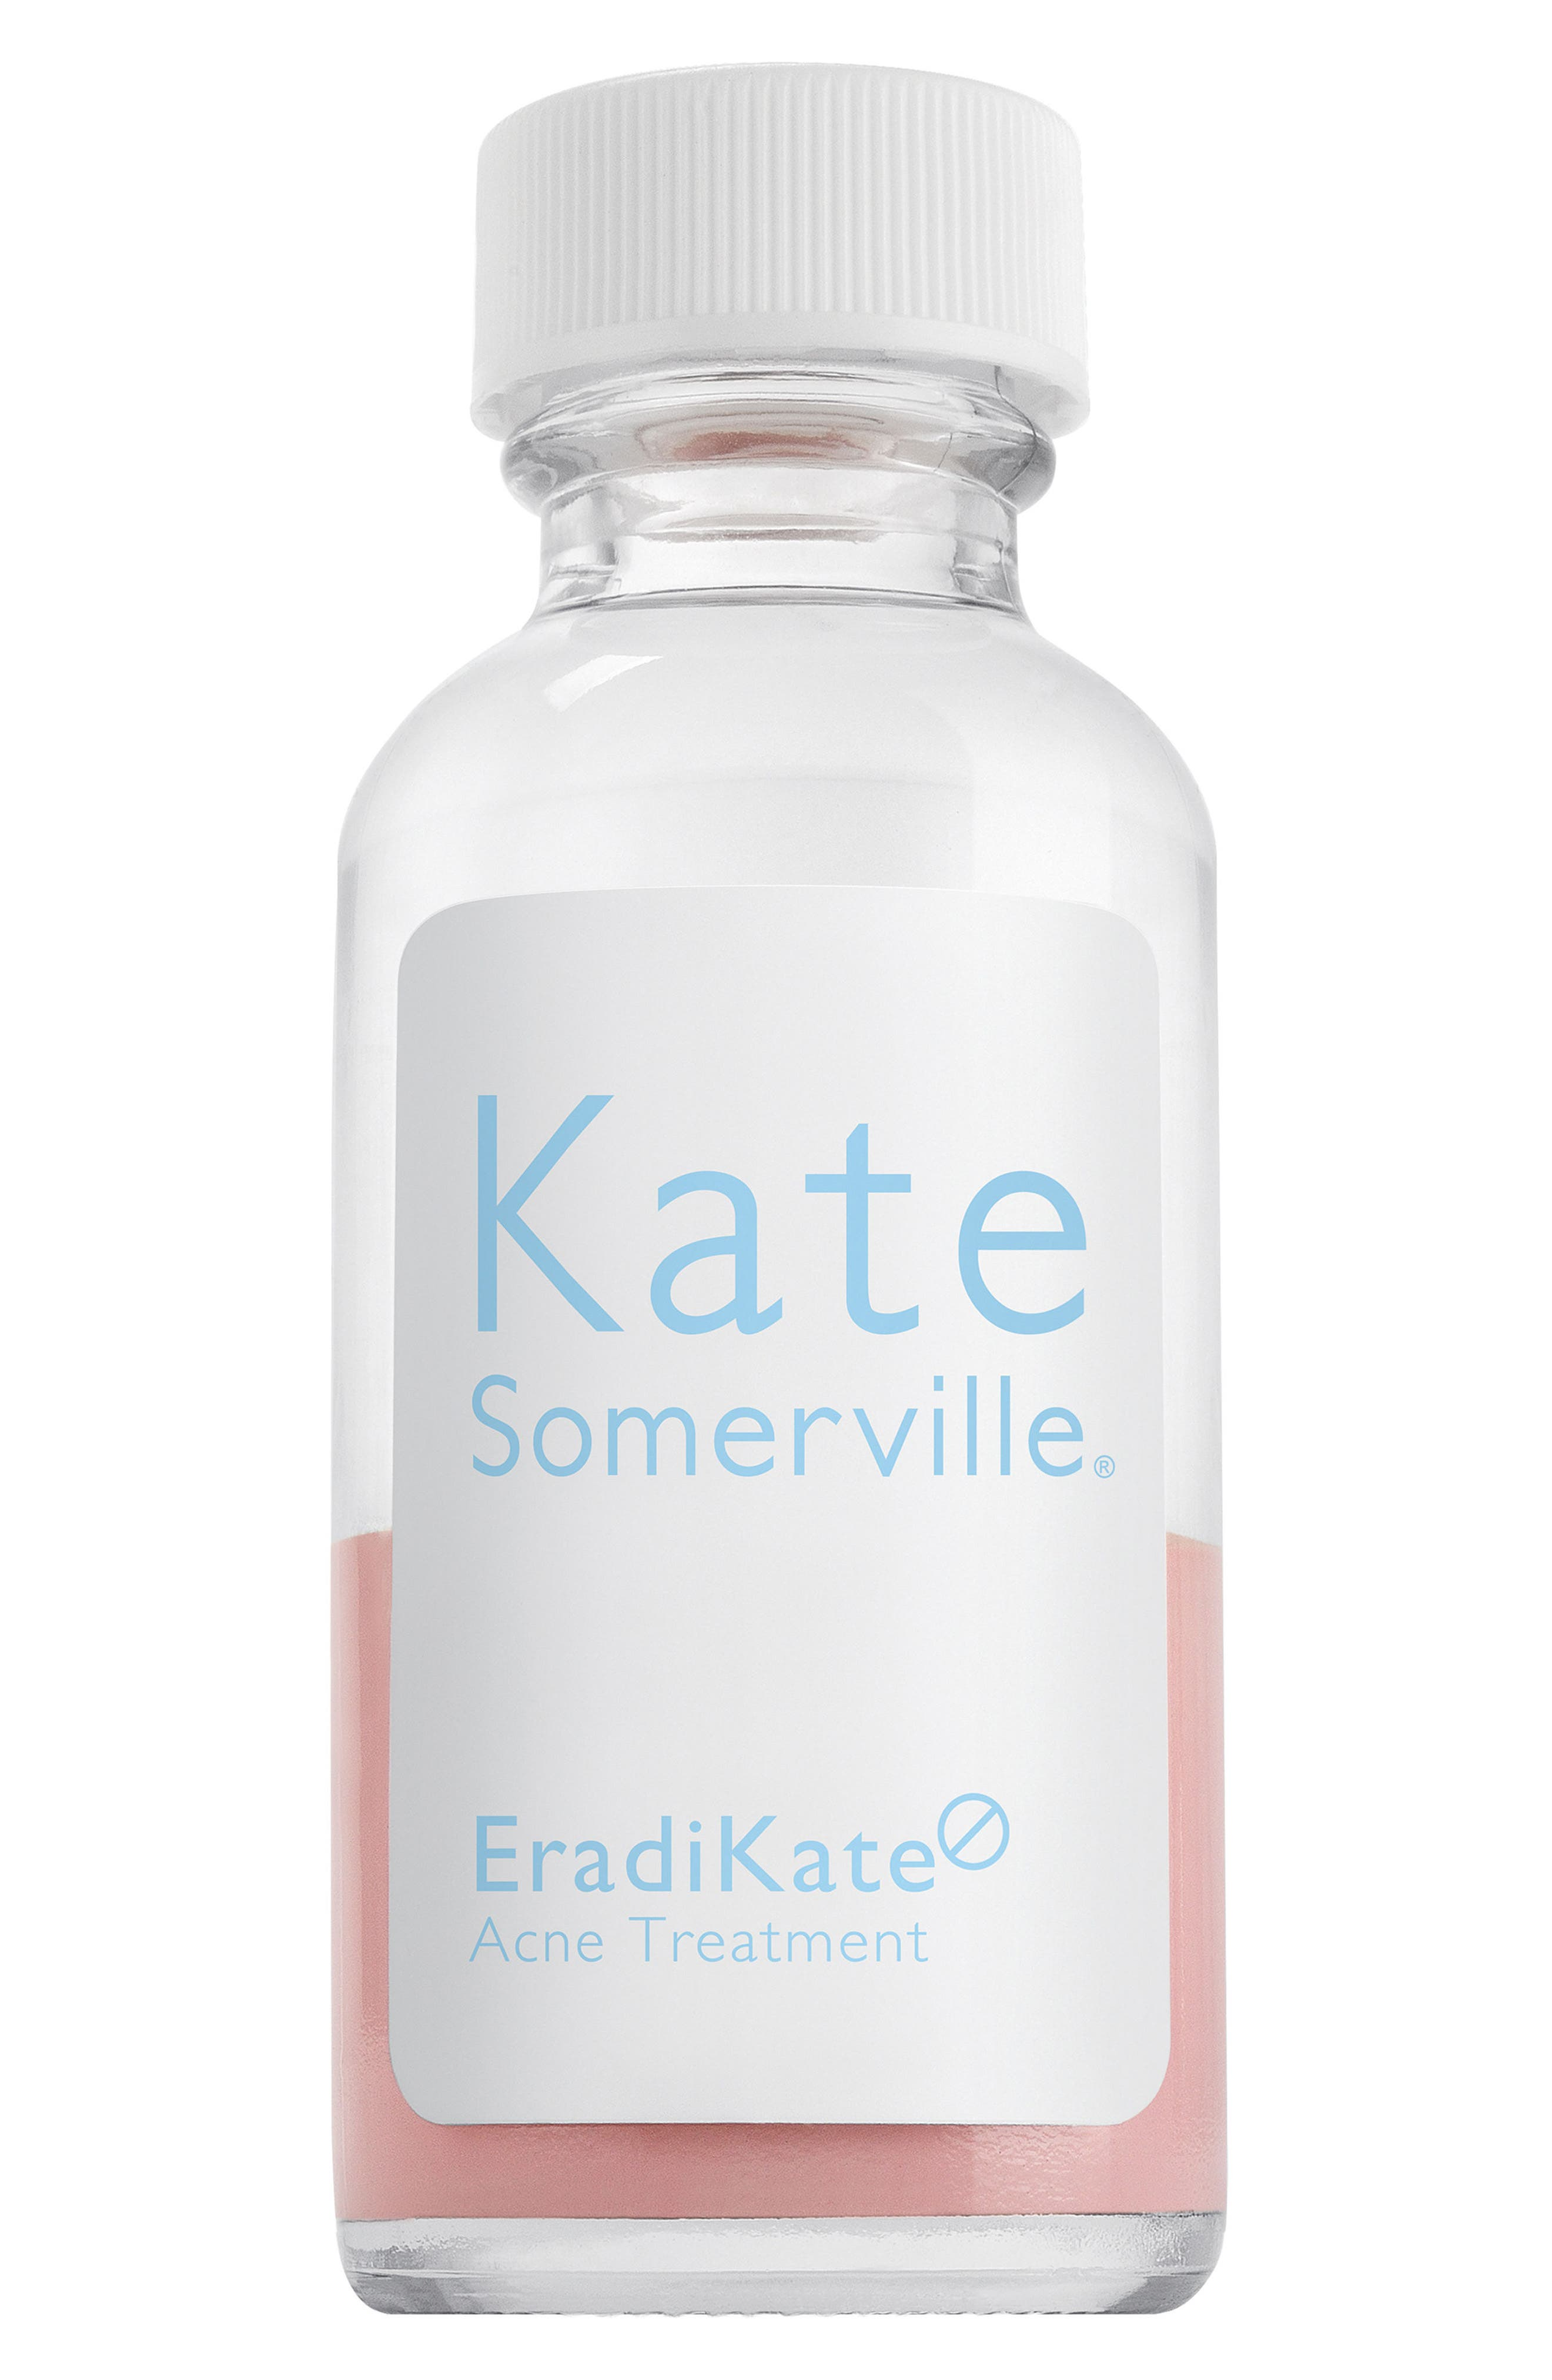 Alternate Image 1 Selected - Kate Somerville® 'EradiKate' Acne Treatment